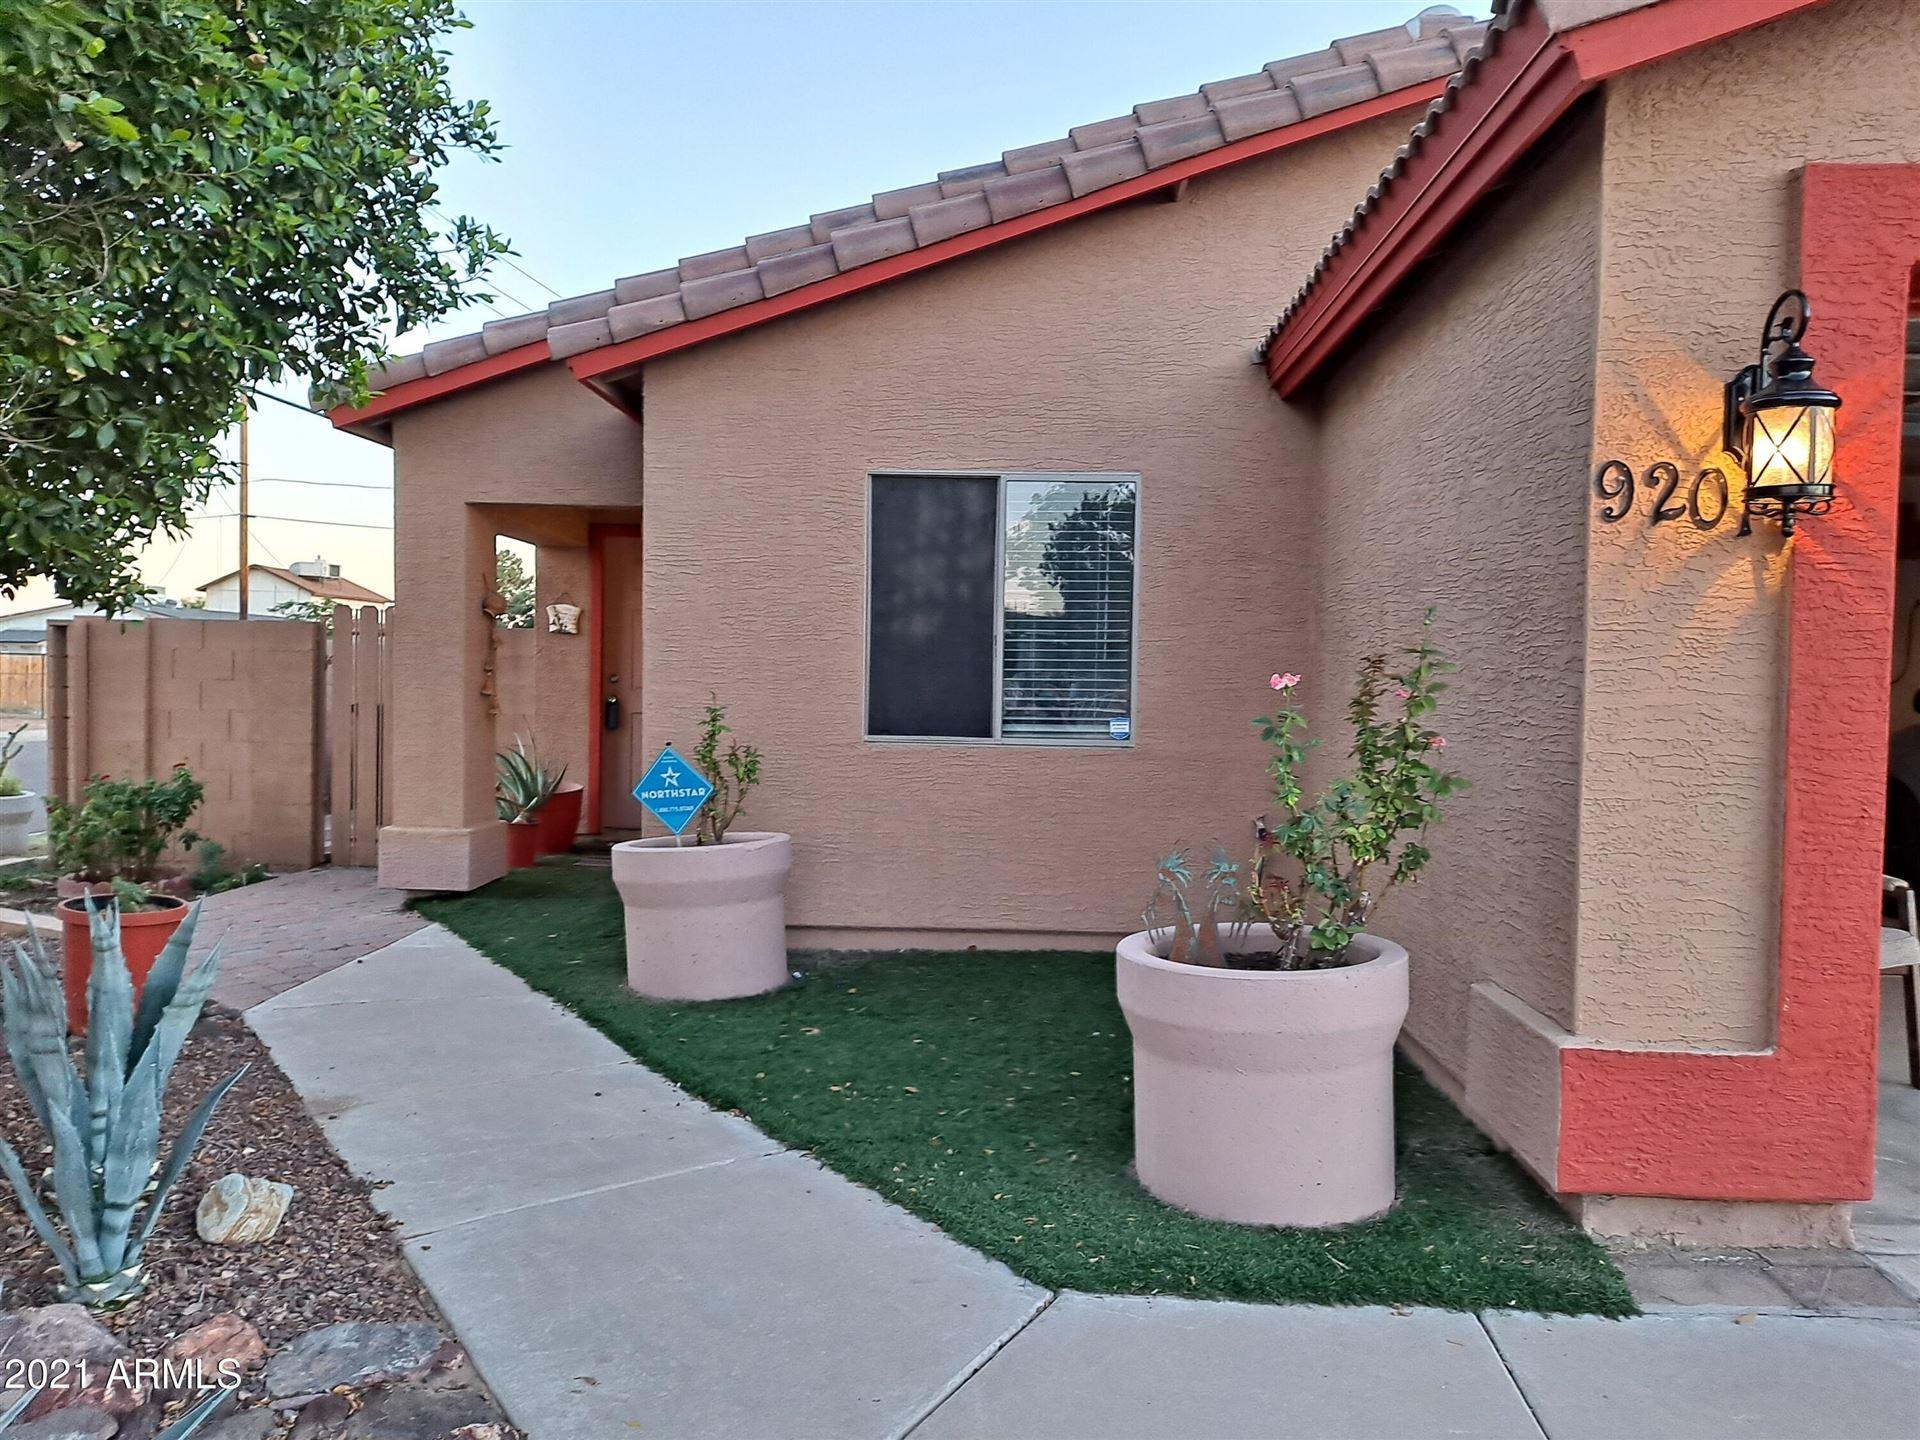 Photo of 9201 W Adams Street, Tolleson, AZ 85353 (MLS # 6305180)